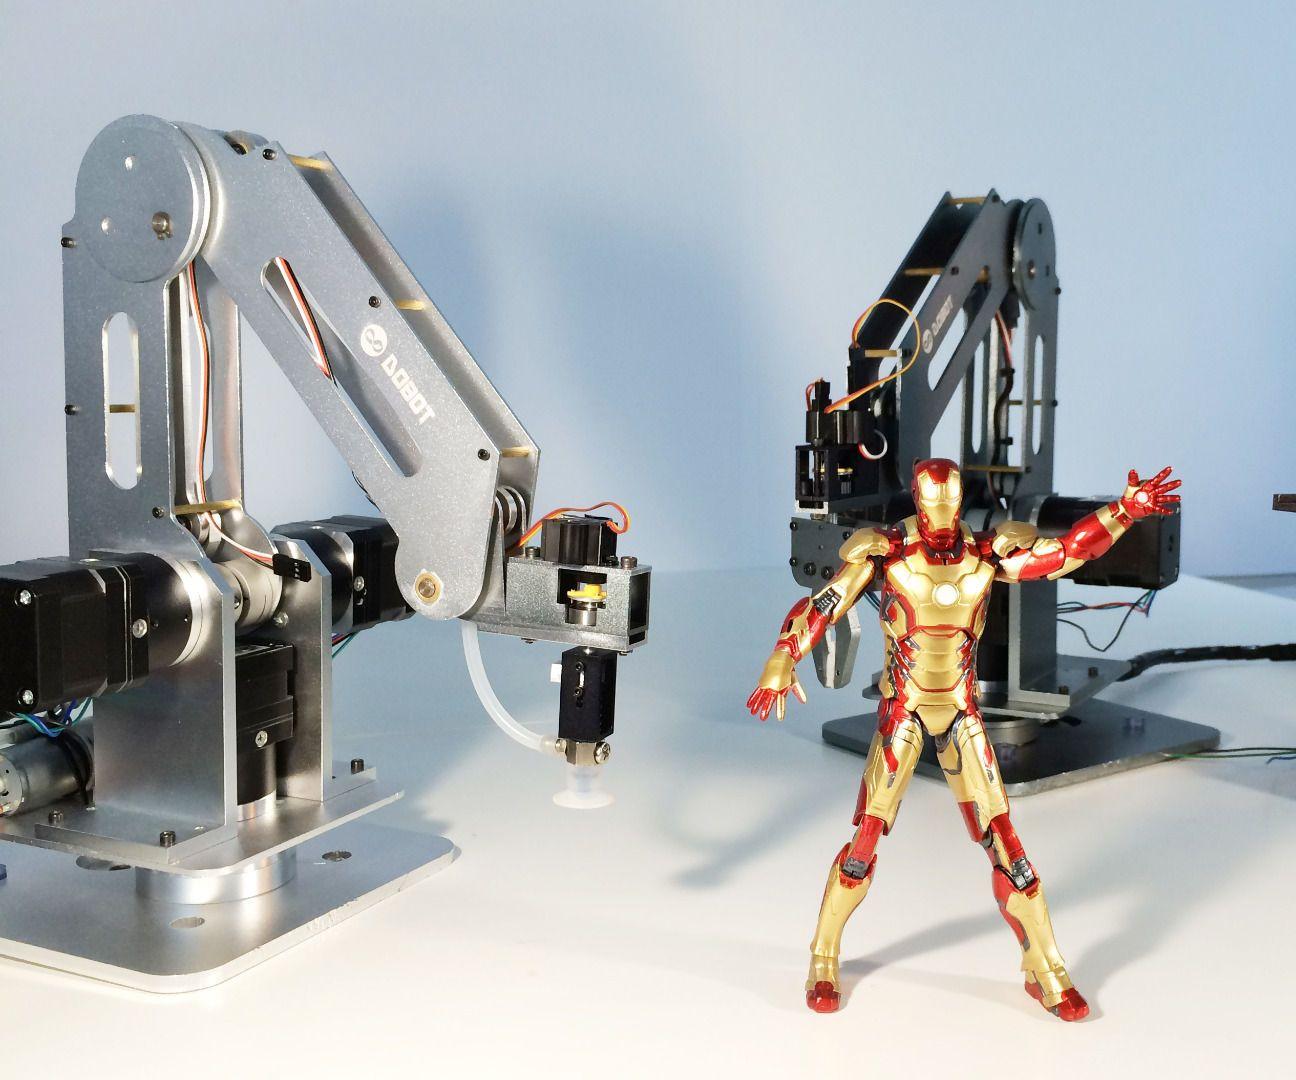 A Multi-controlled High Precision Desktop Robotic Arm | Robot arm ...